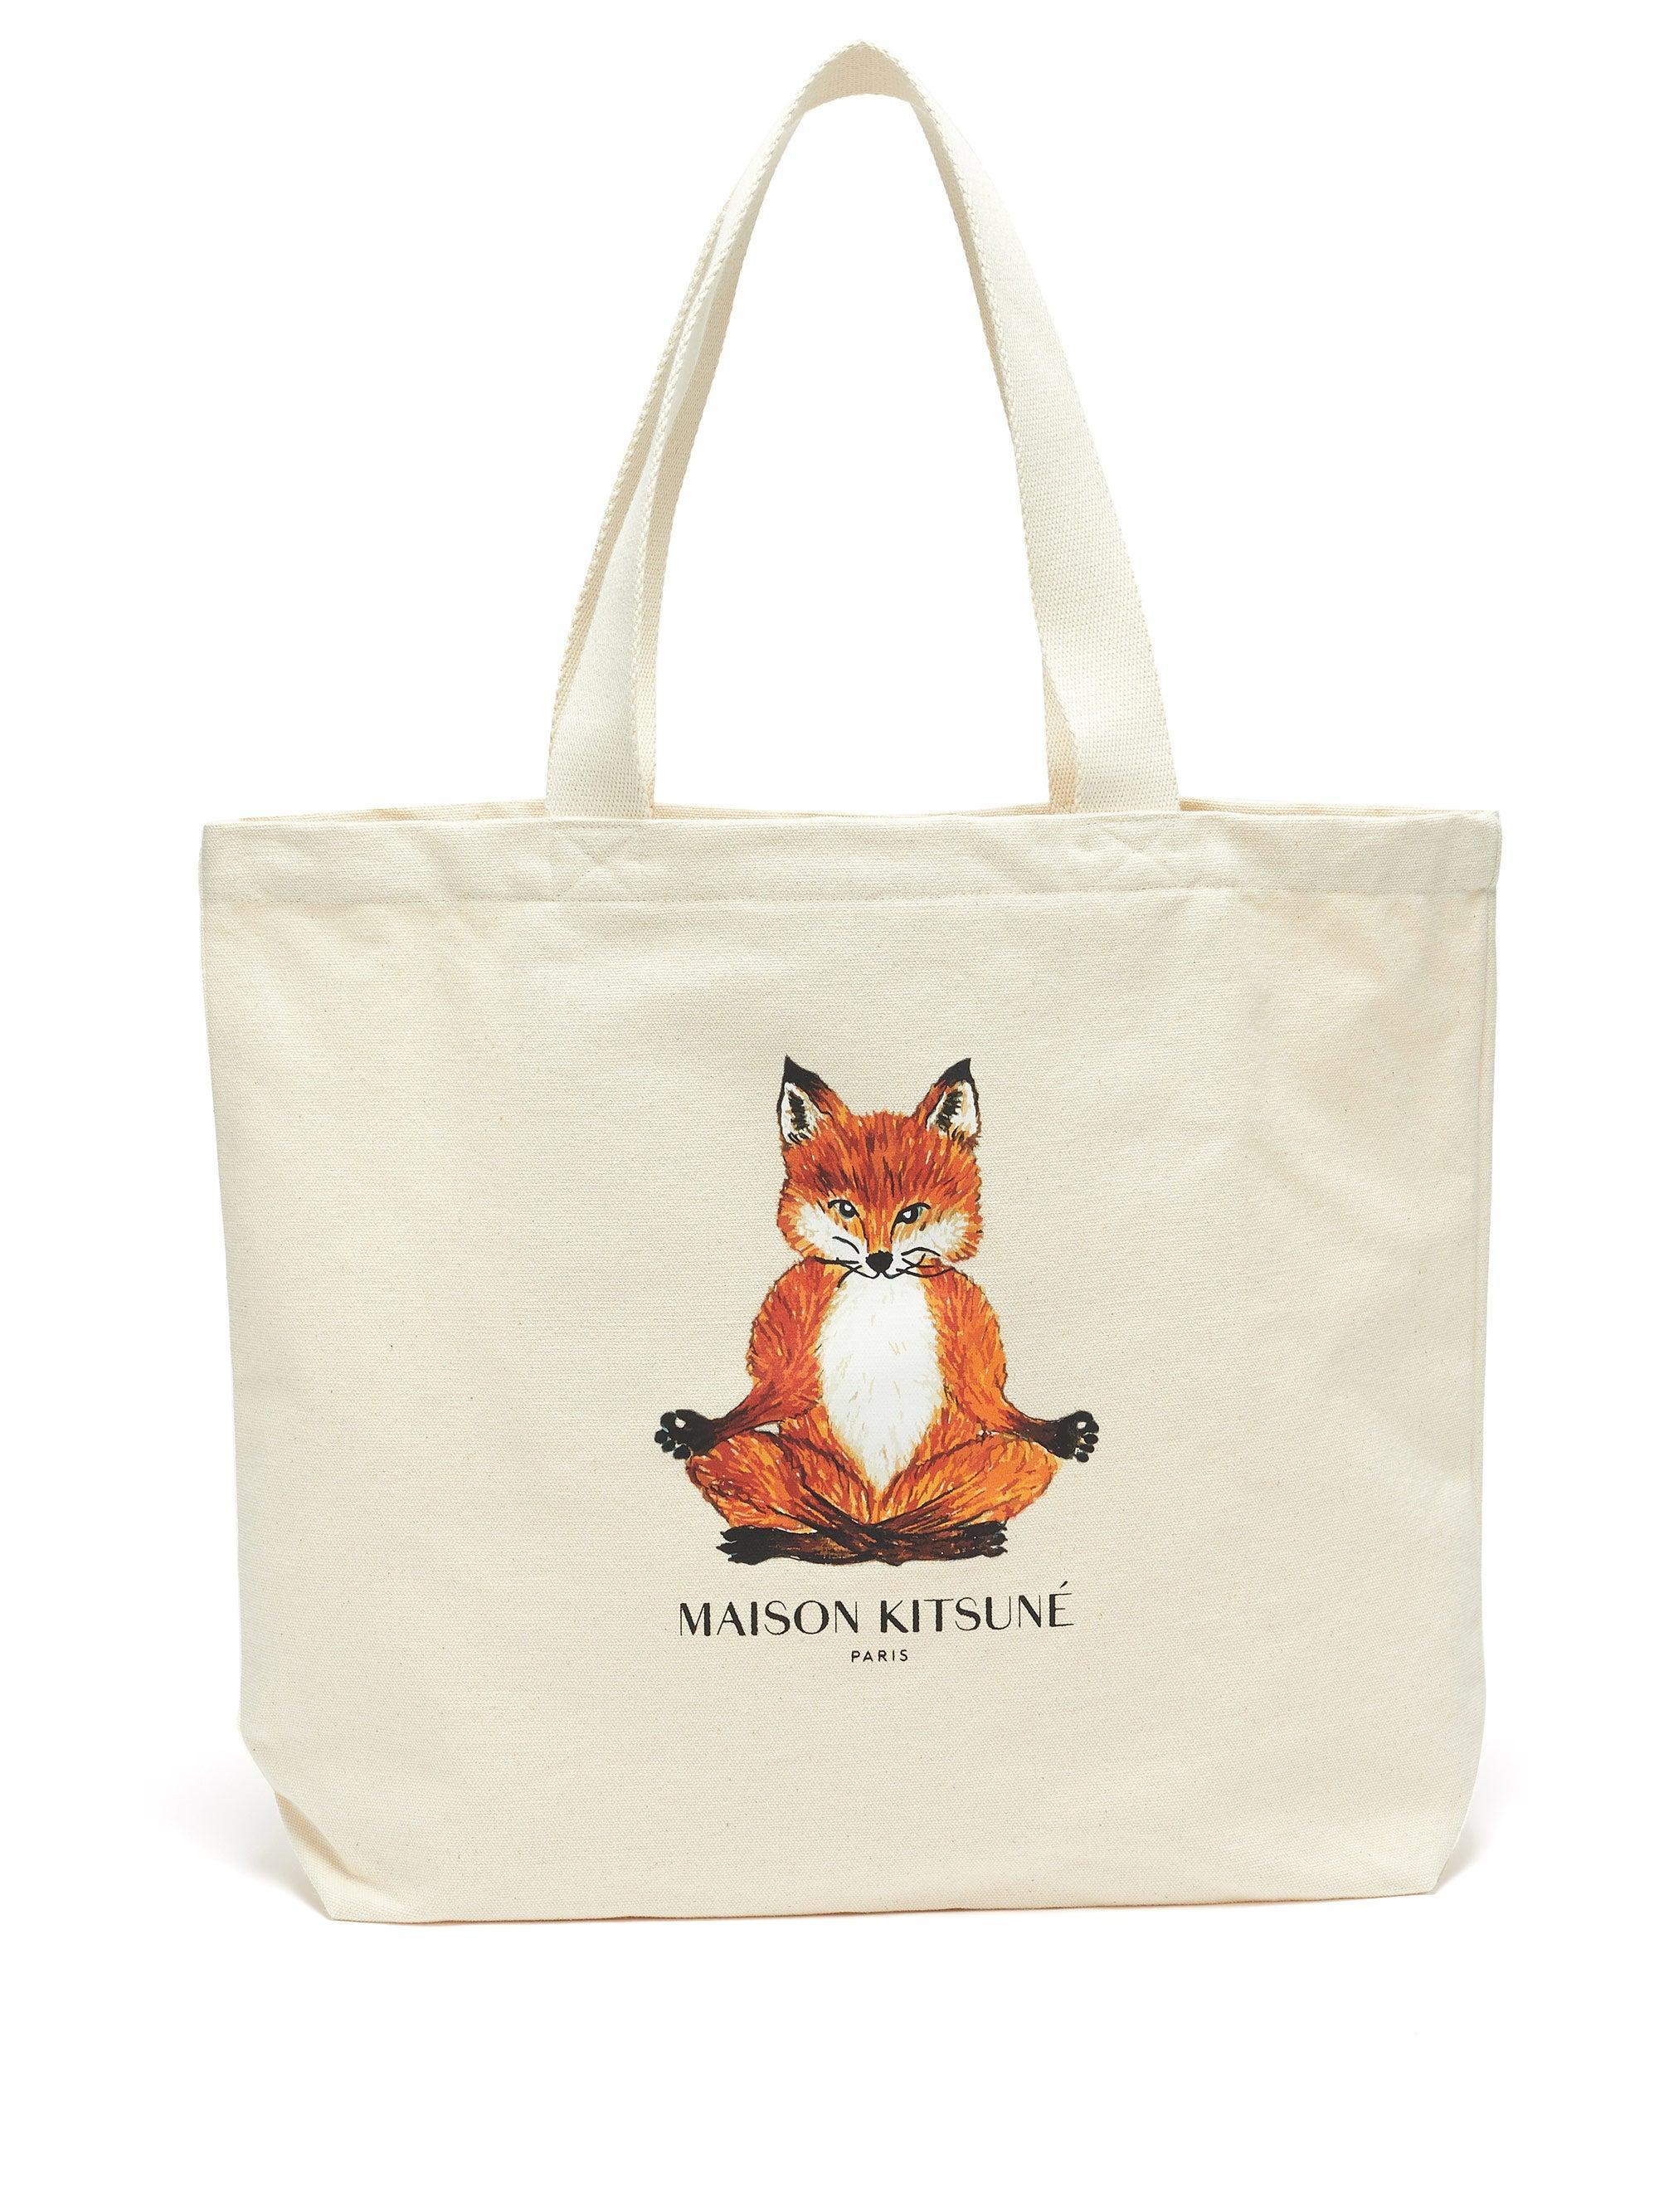 Fox Embroidered Bag Cotton Canvas Messenger Bag